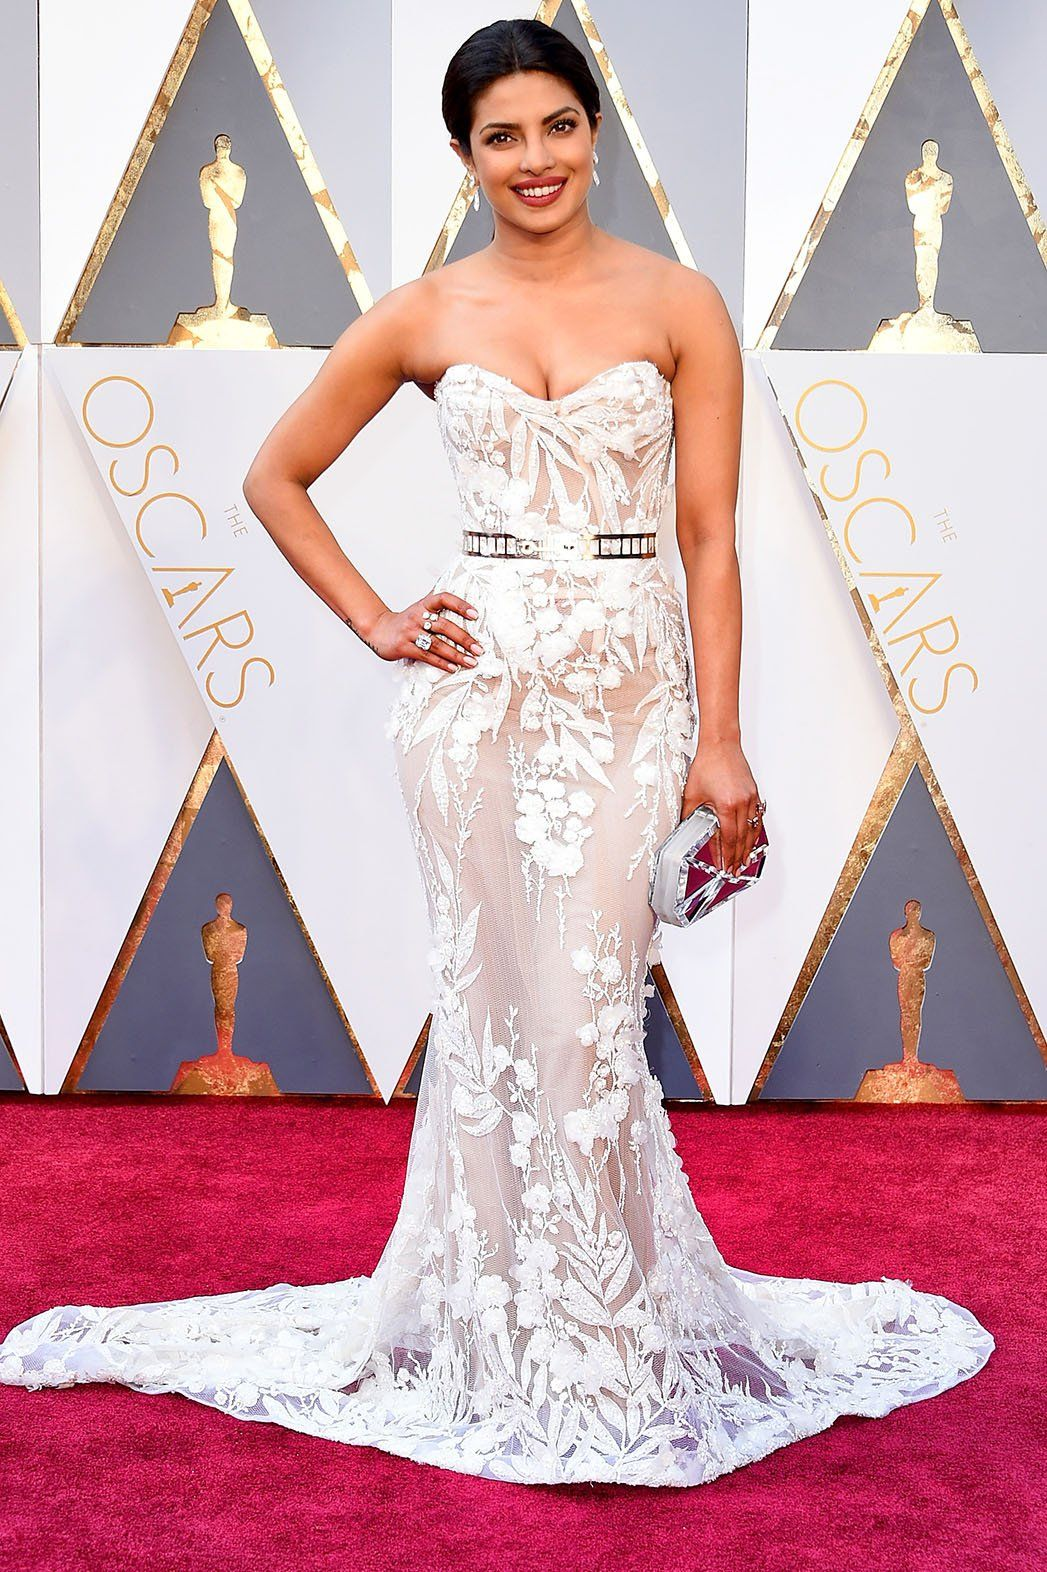 Oscars Red Carpet Photos Best Oscar Dresses Priyanka Chopra Red Carpet Oscar Dresses